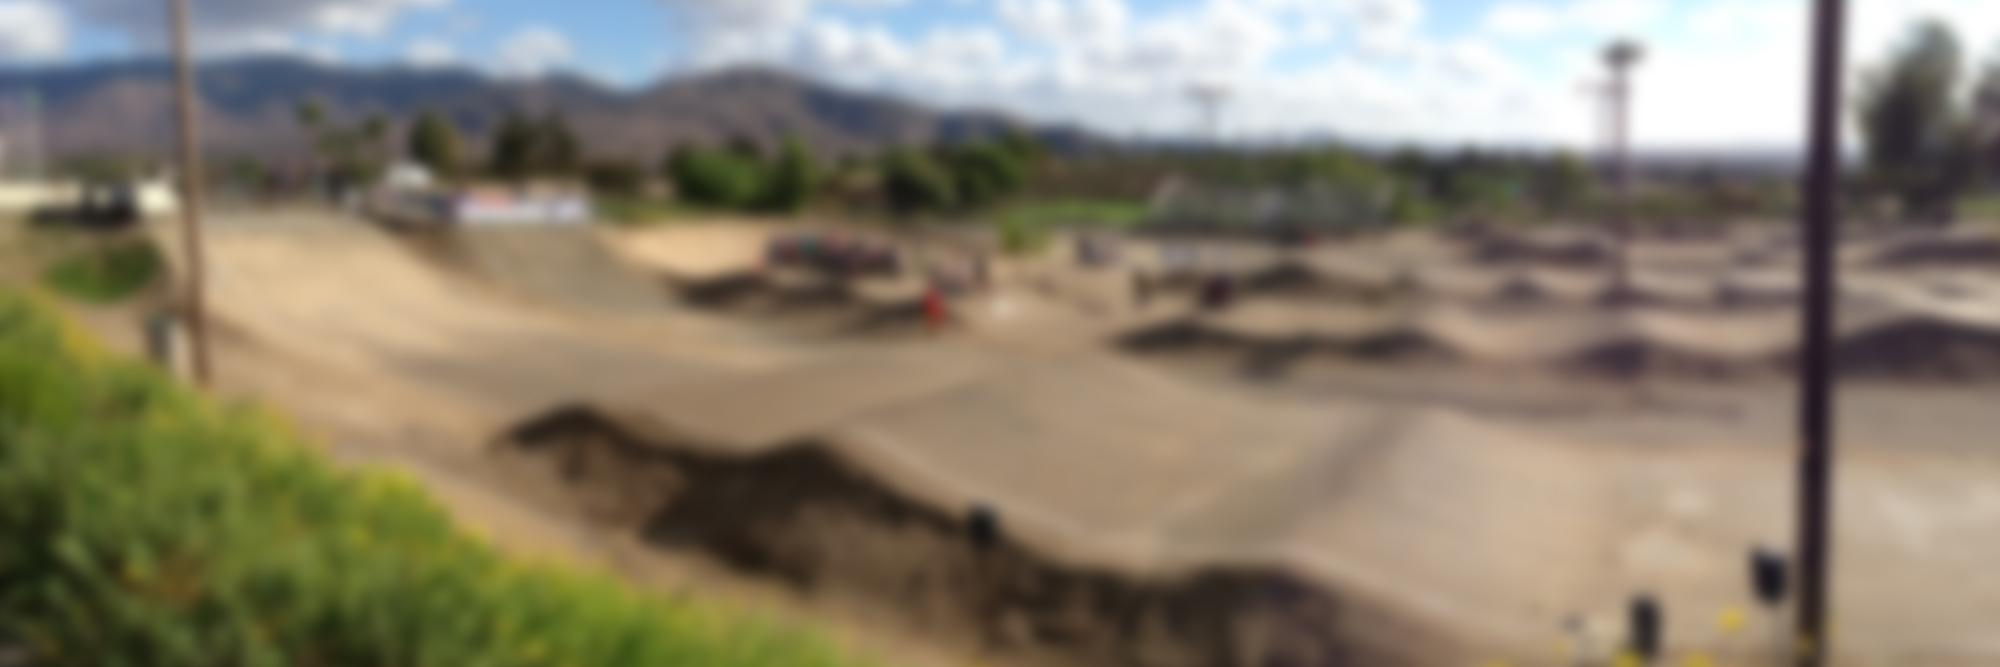 race track blurred